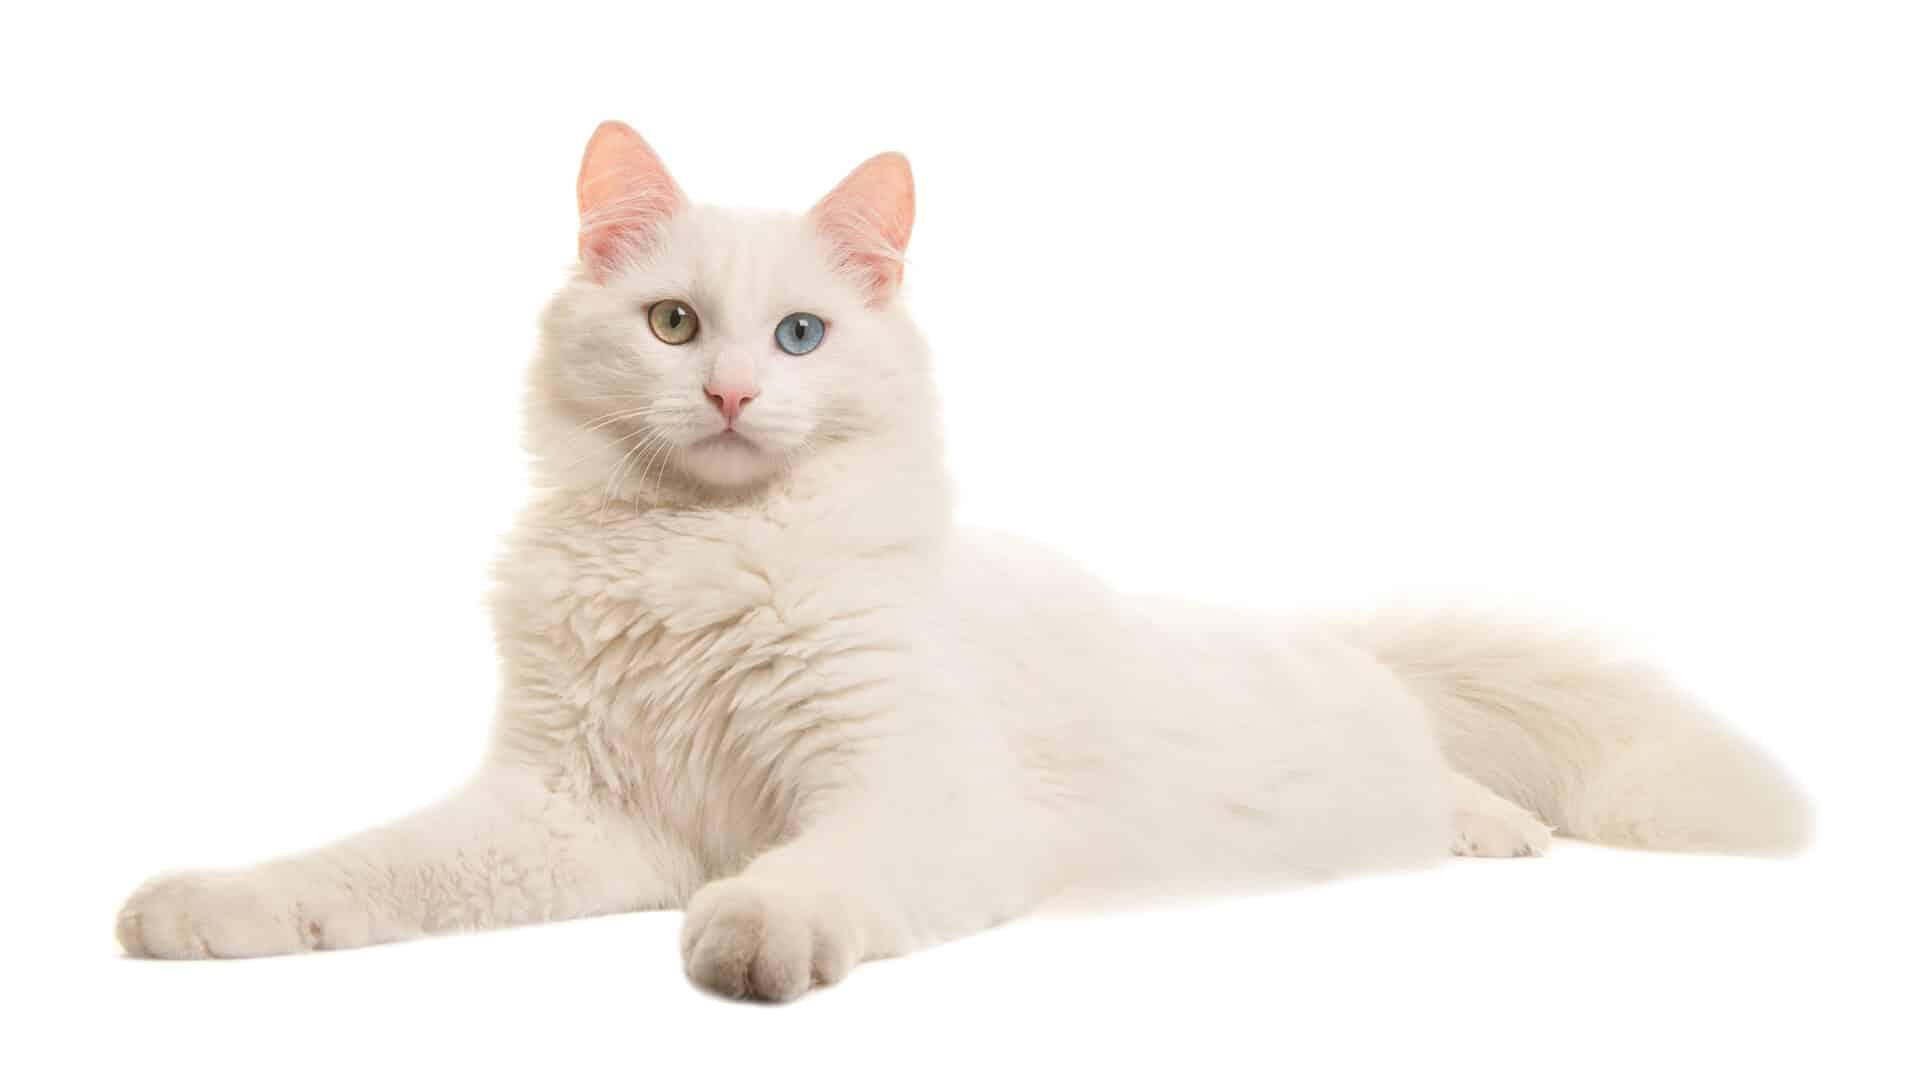 Turkish Angora cat breed facts